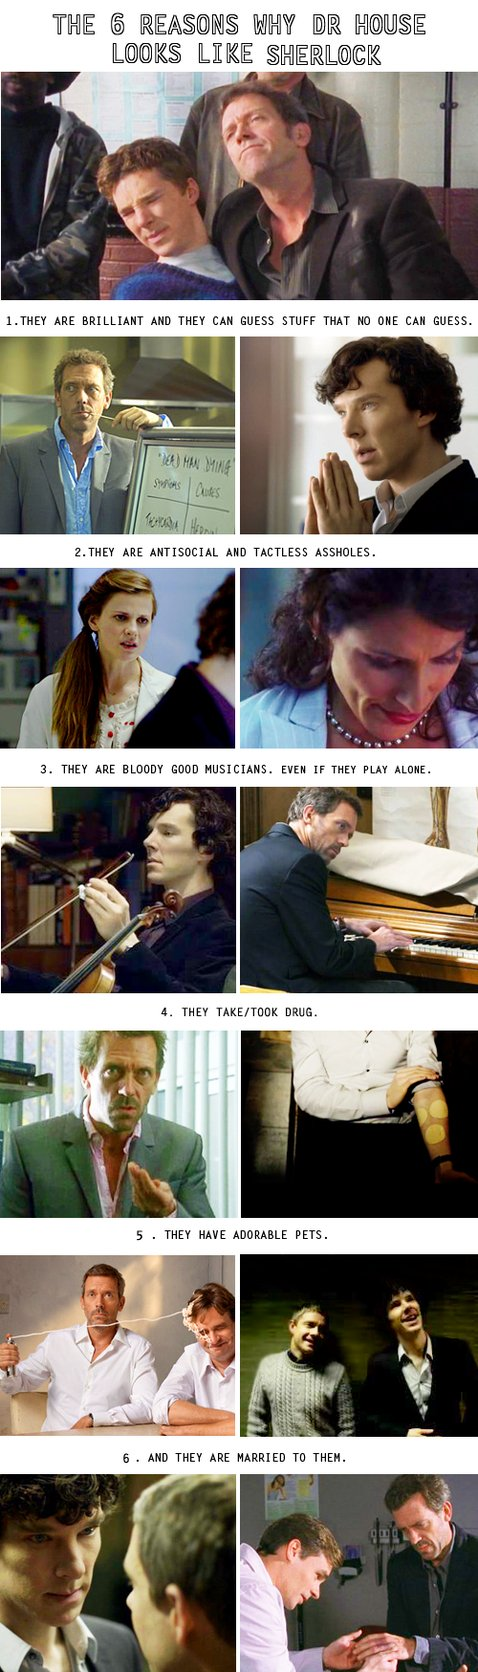 Sherlock vs. House. I love that House is actually based on Sherlock Holmes